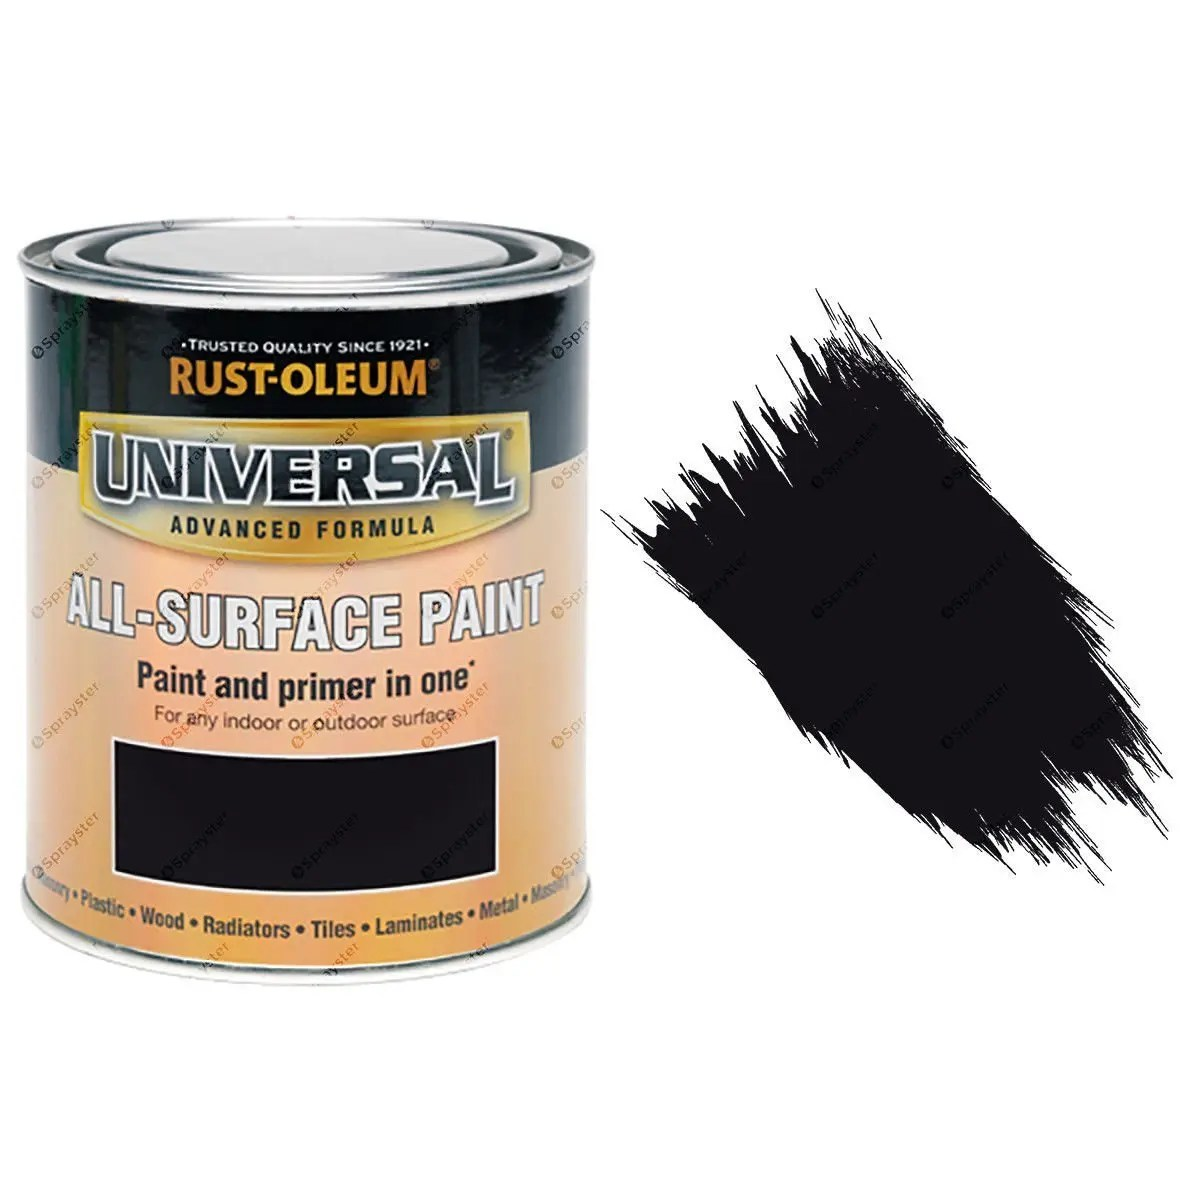 Rust-Oleum-Universal-All-Surface-Self-Primer-Brush-Paint-Gloss-Black-250ml-372229925944